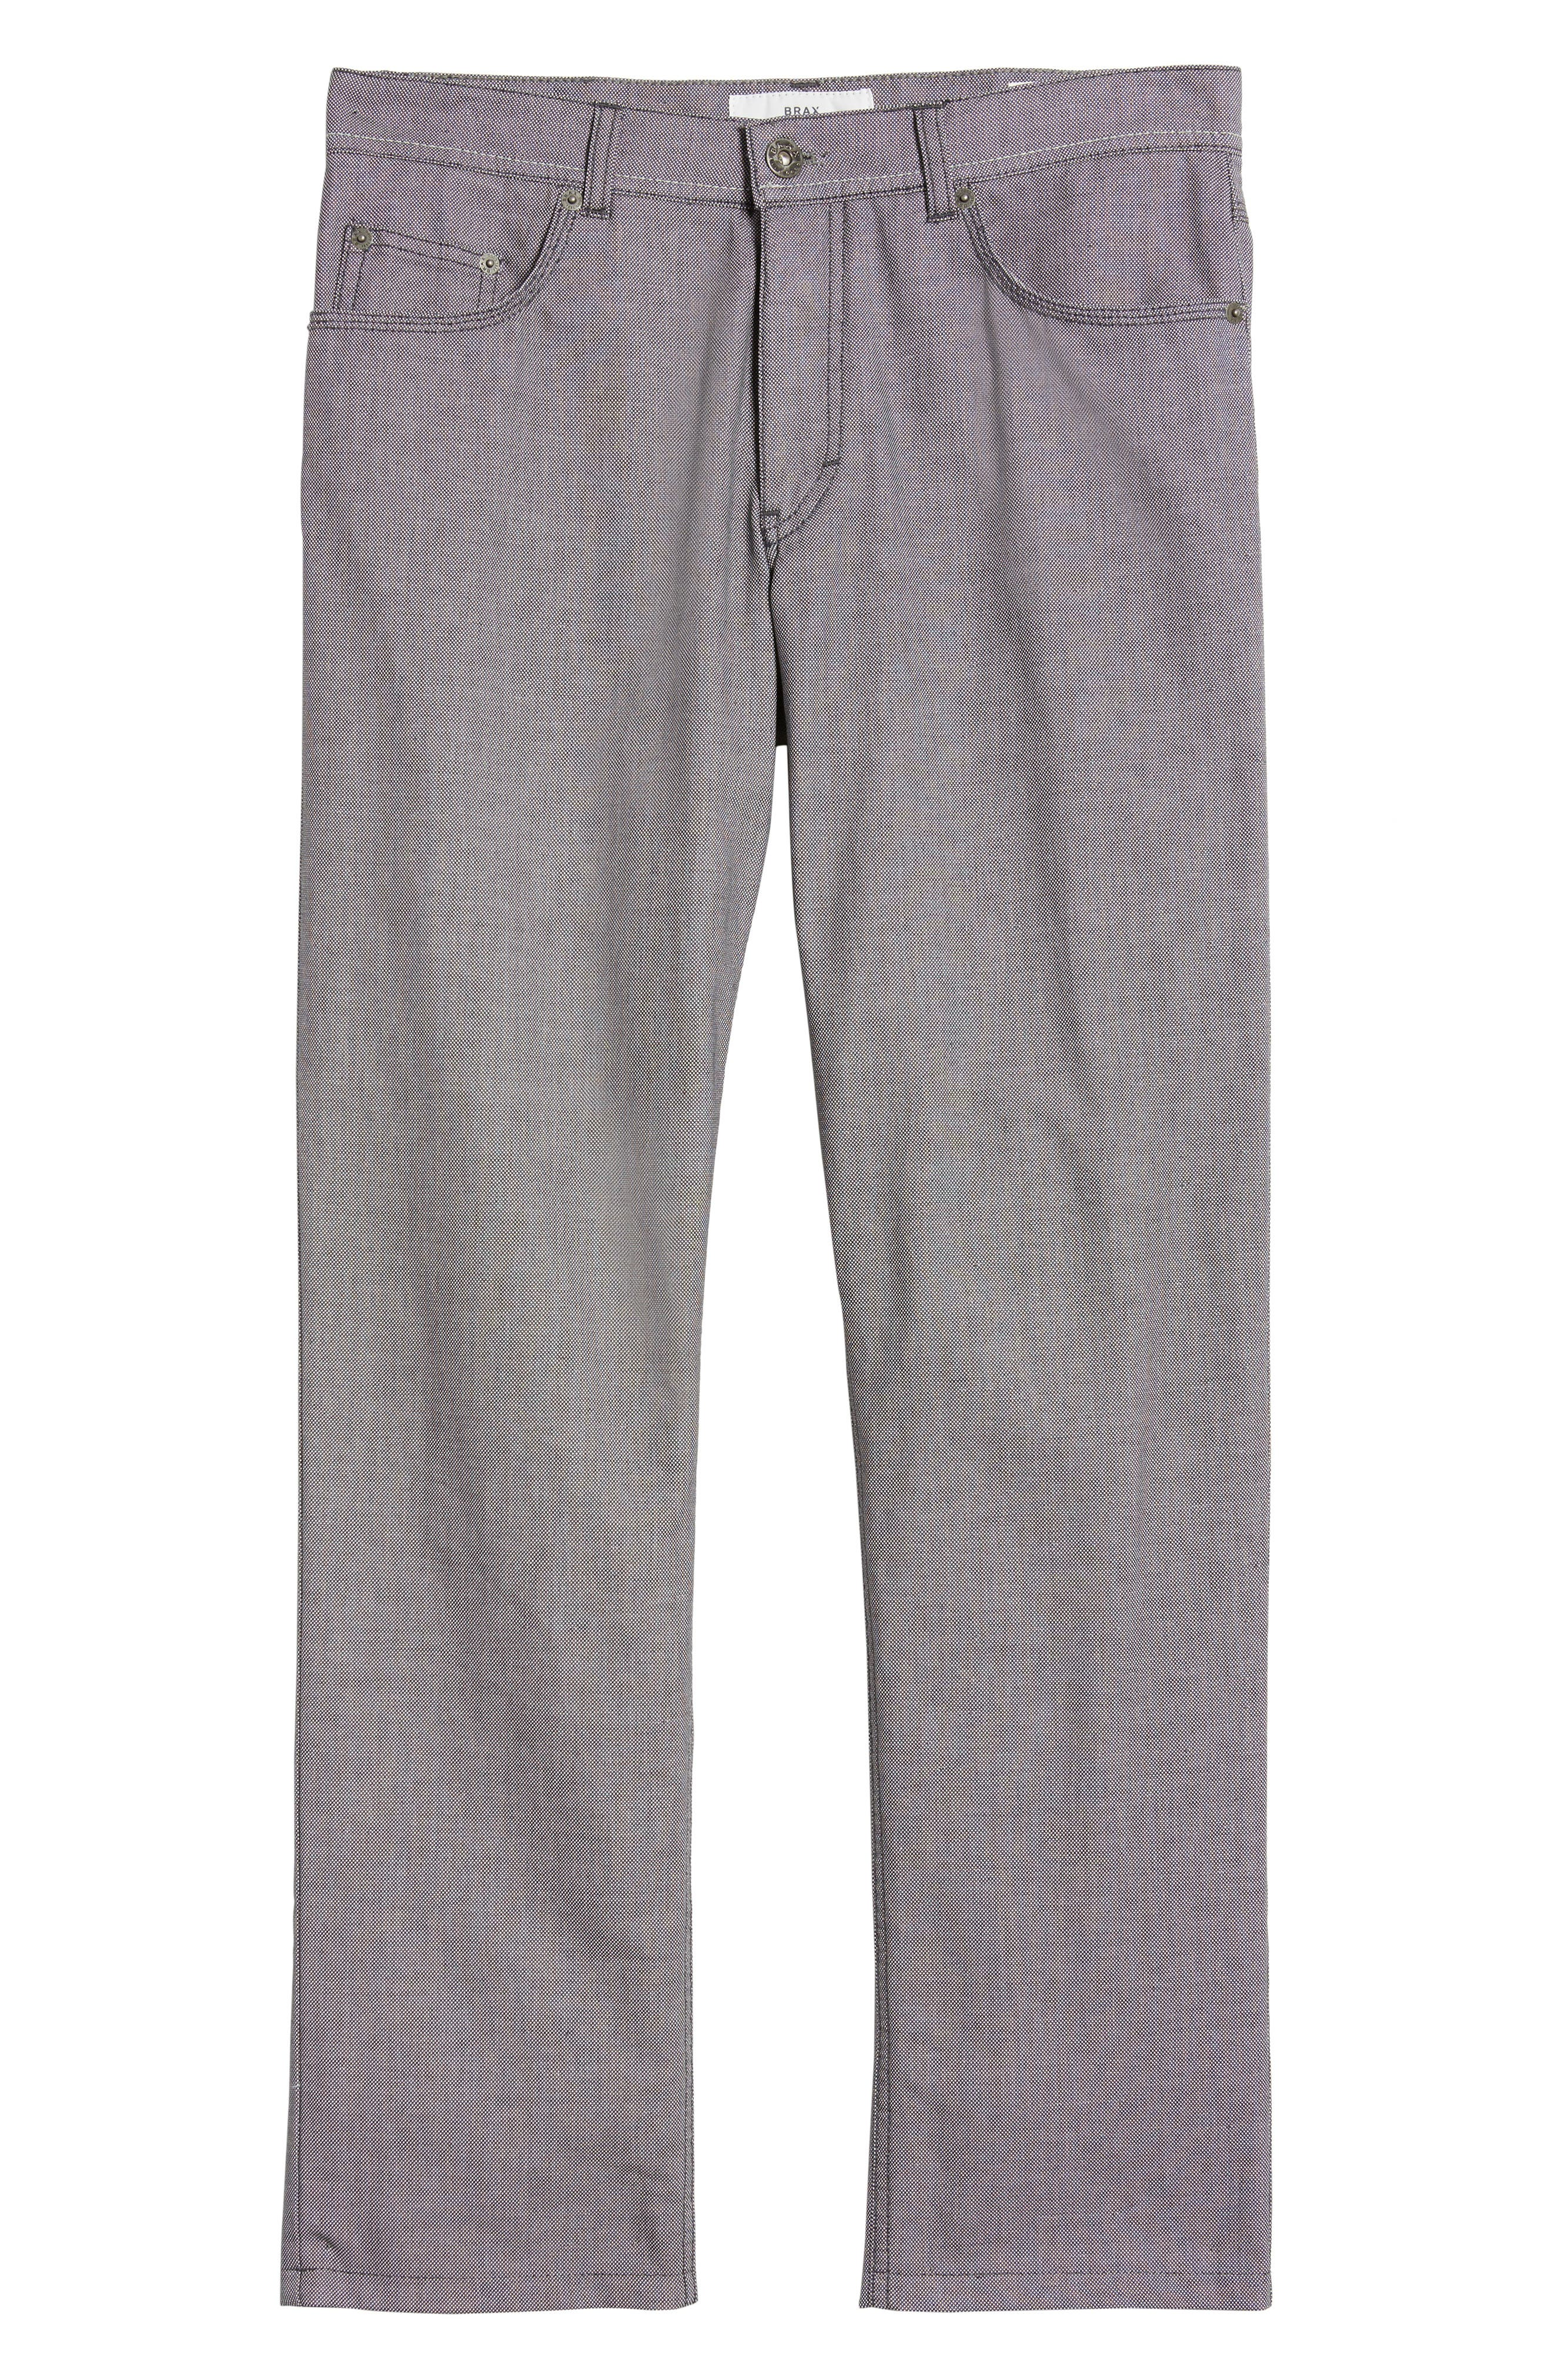 Cooper Bird's Eye Stretch Cotton Pants,                             Alternate thumbnail 6, color,                             Grey